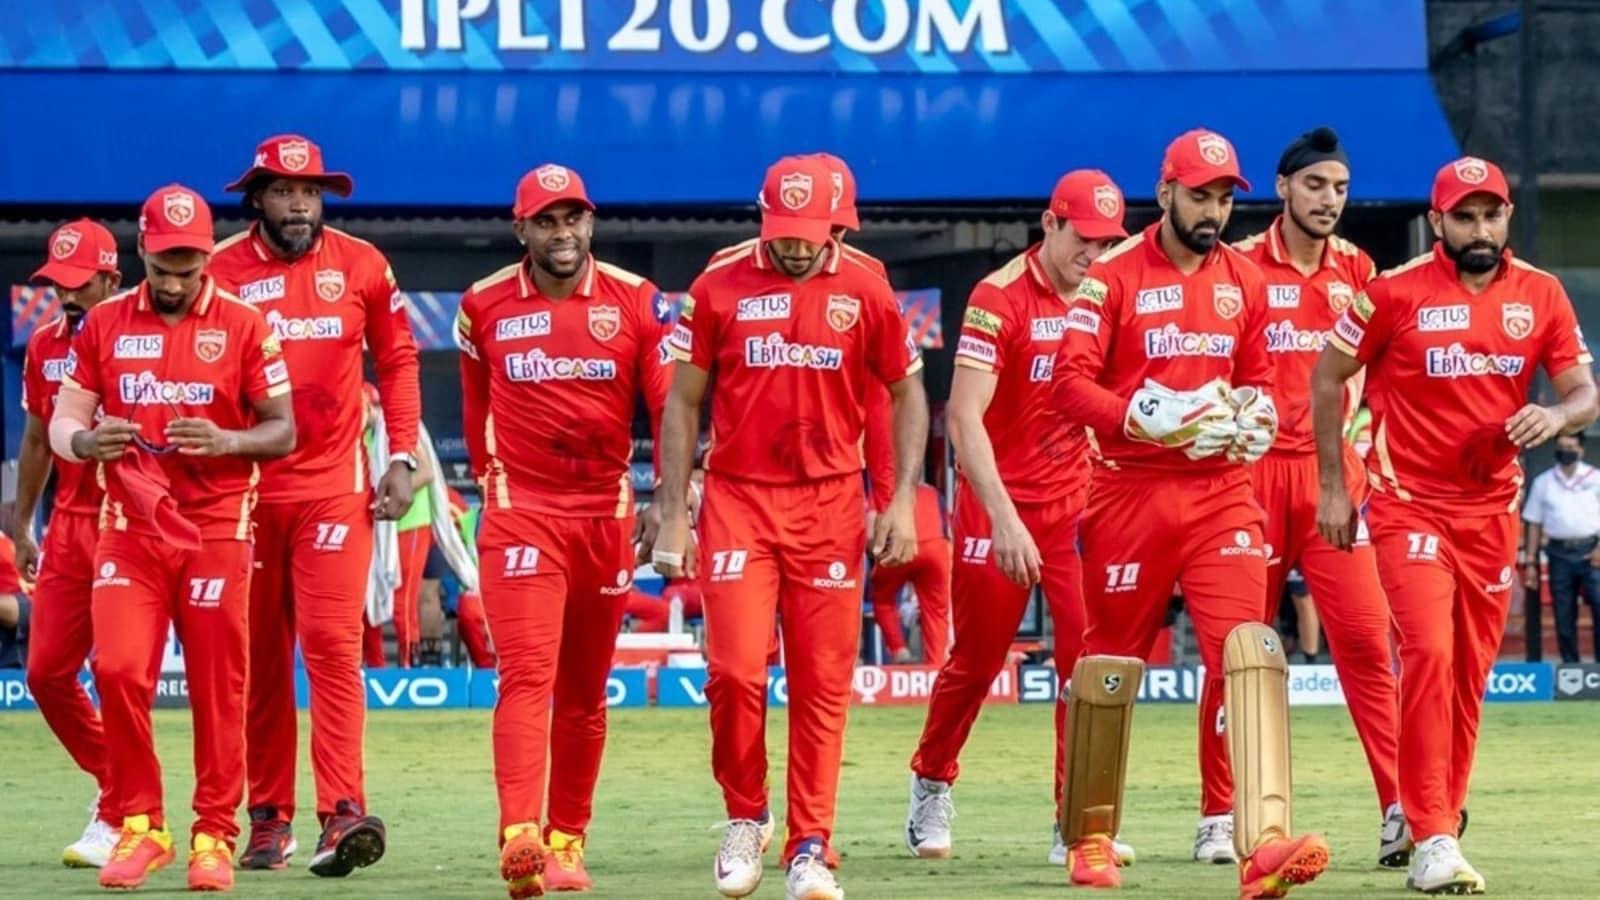 He may take 3-4 seasons to become a reliable finisher': Styris wants Punjab  Kings batsman to follow Mumbai Indians star | Hindustan Times